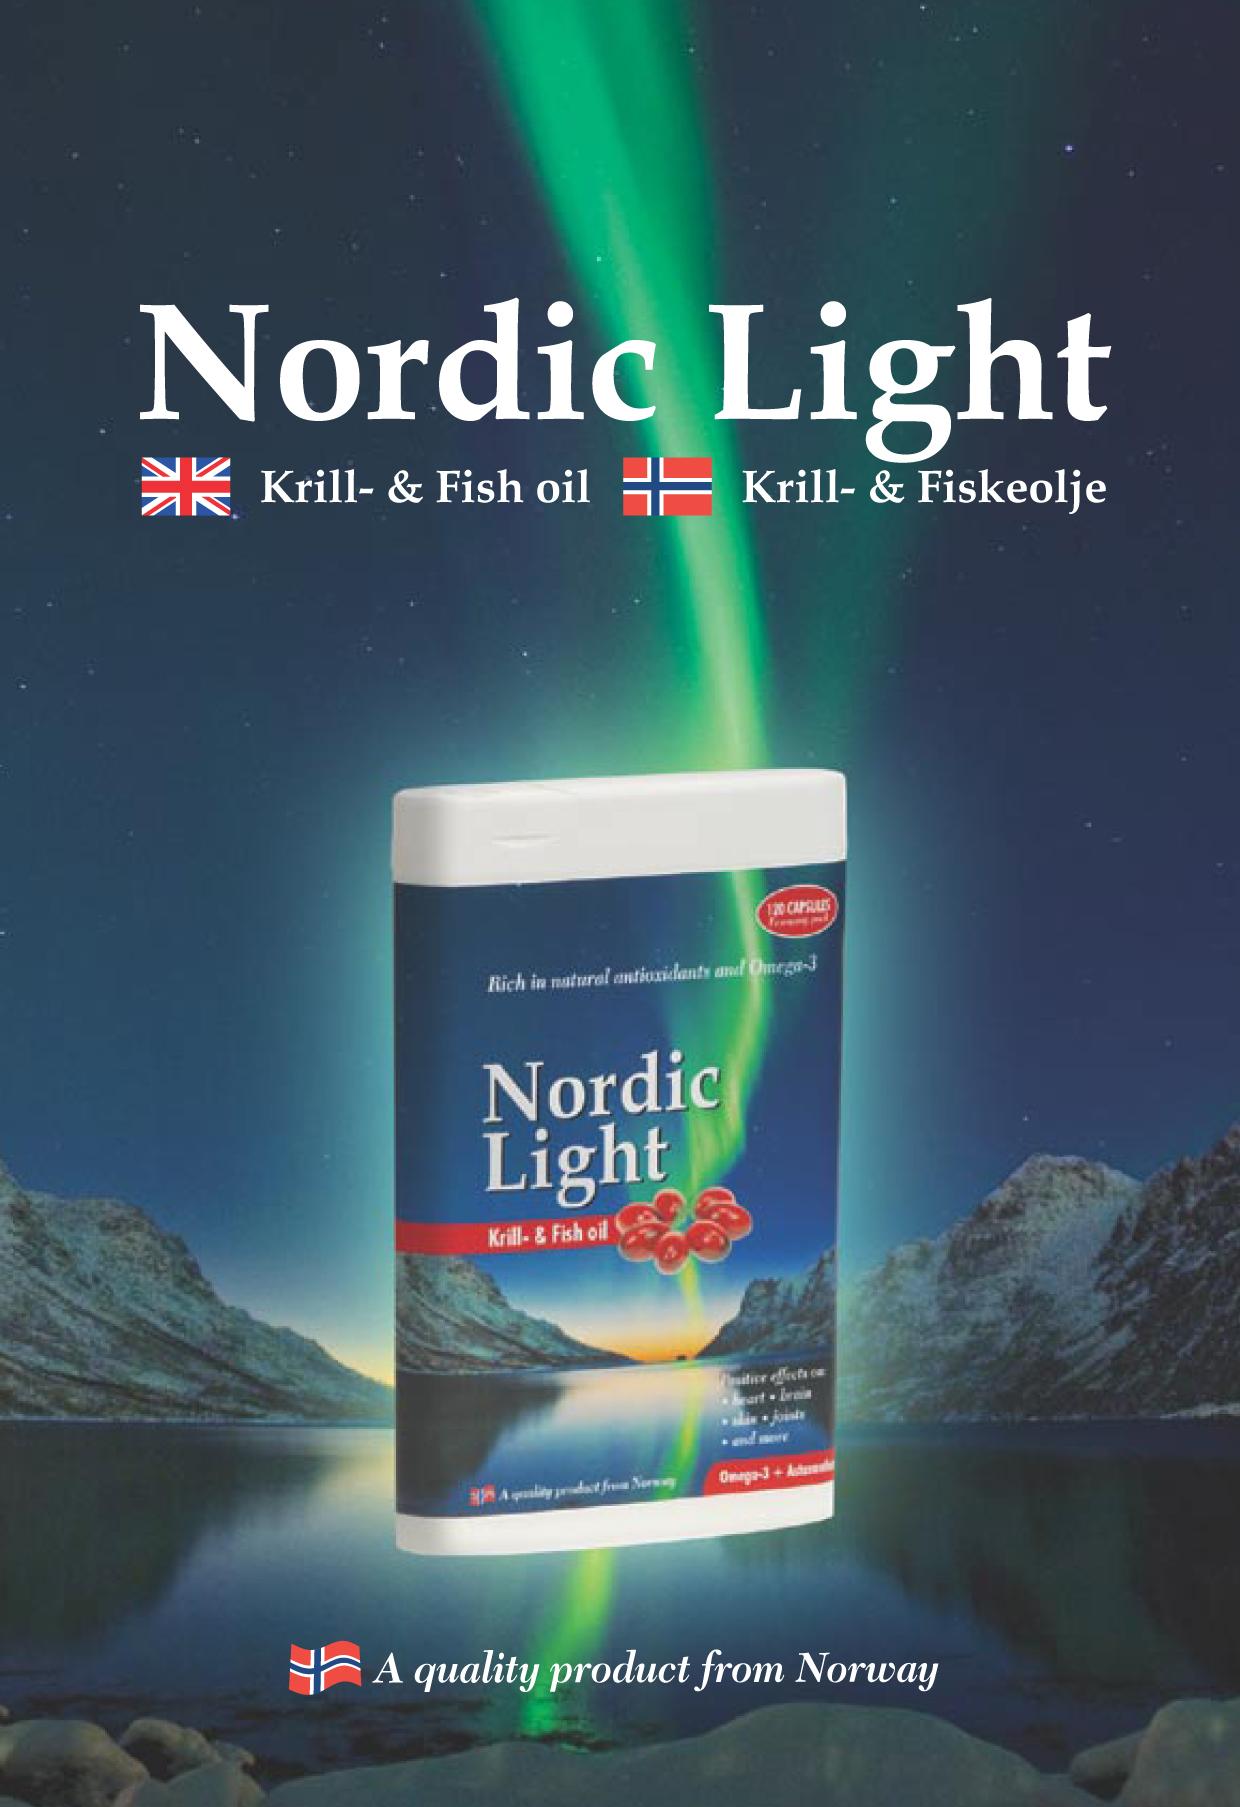 Nordic Light Krill- & Fish oil